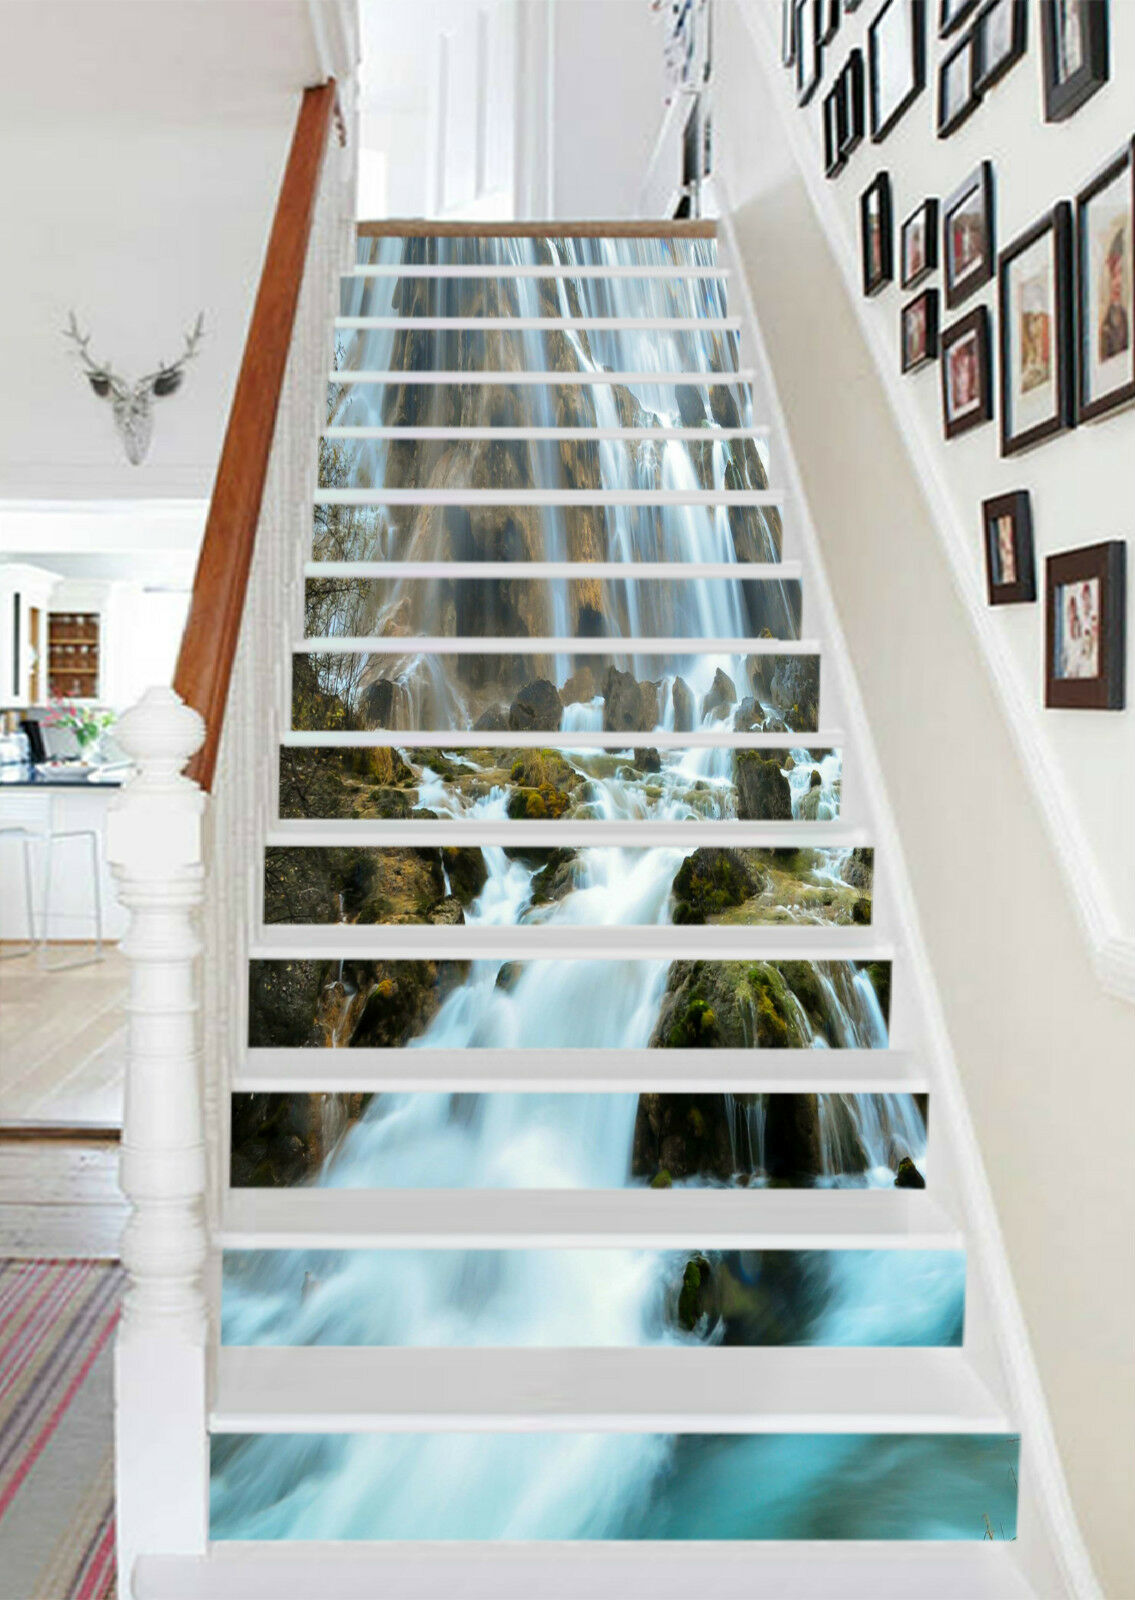 3D Wasserfall 261 Stair Risers Dekoration Fototapete Vinyl Aufkleber Tapete DE